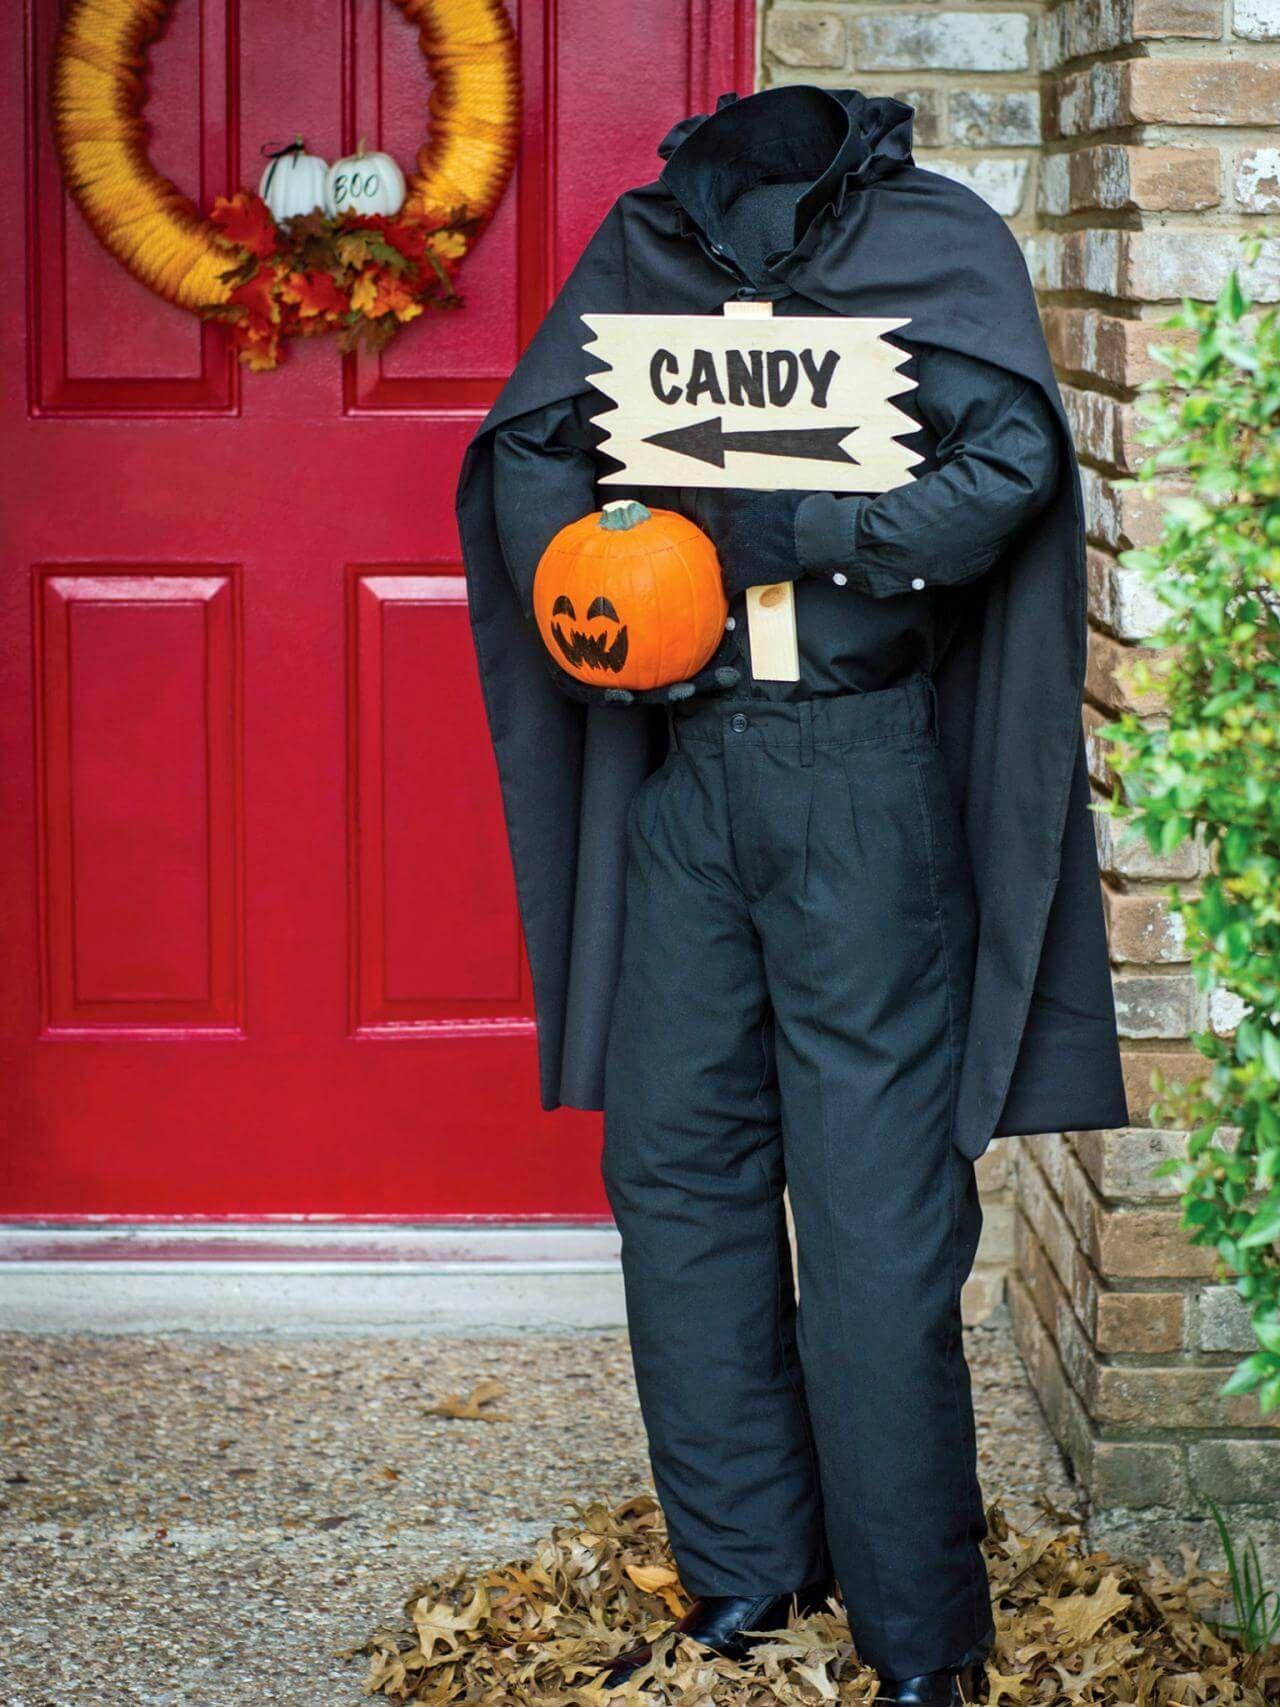 20 Impressive Halloween Decoration Ideas 2018 Halloween Fall